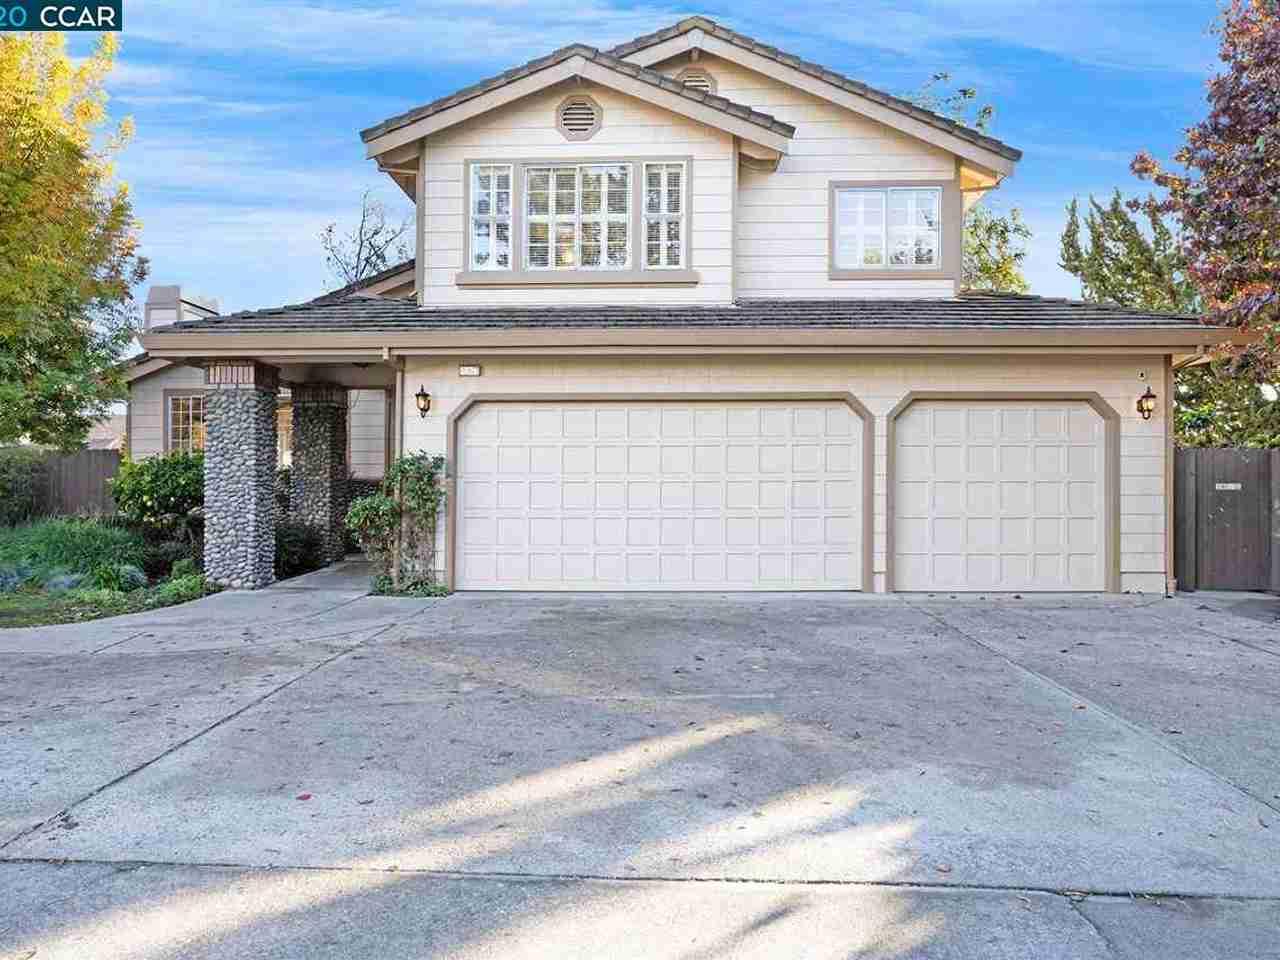 3629 Corte Rubiolo Castro Valley, CA, 94546